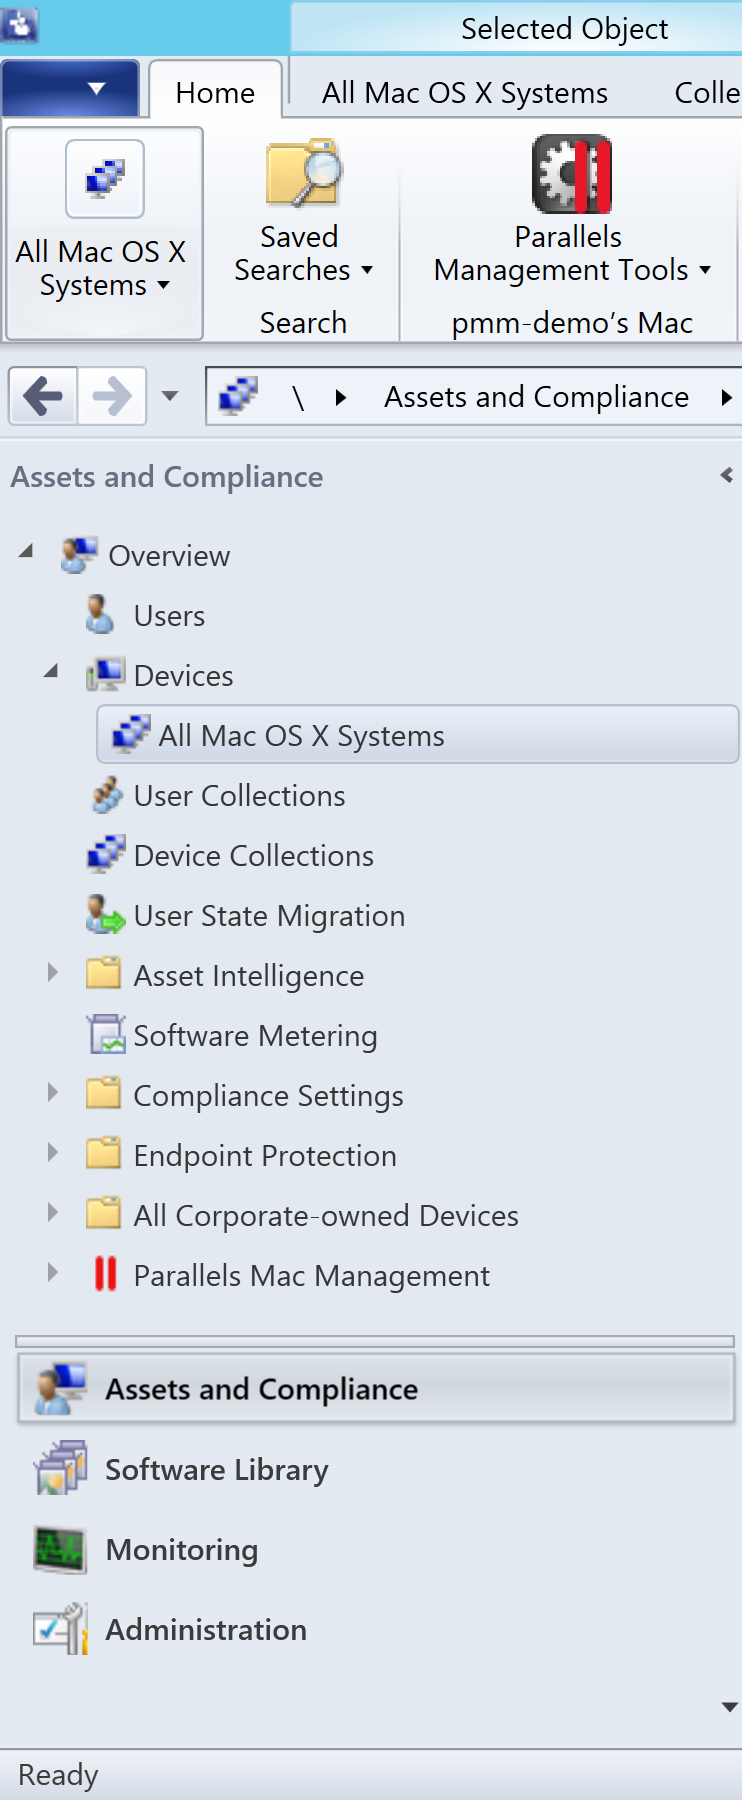 Parallels Mac Management for Microsoft SCCM Reviews 2019